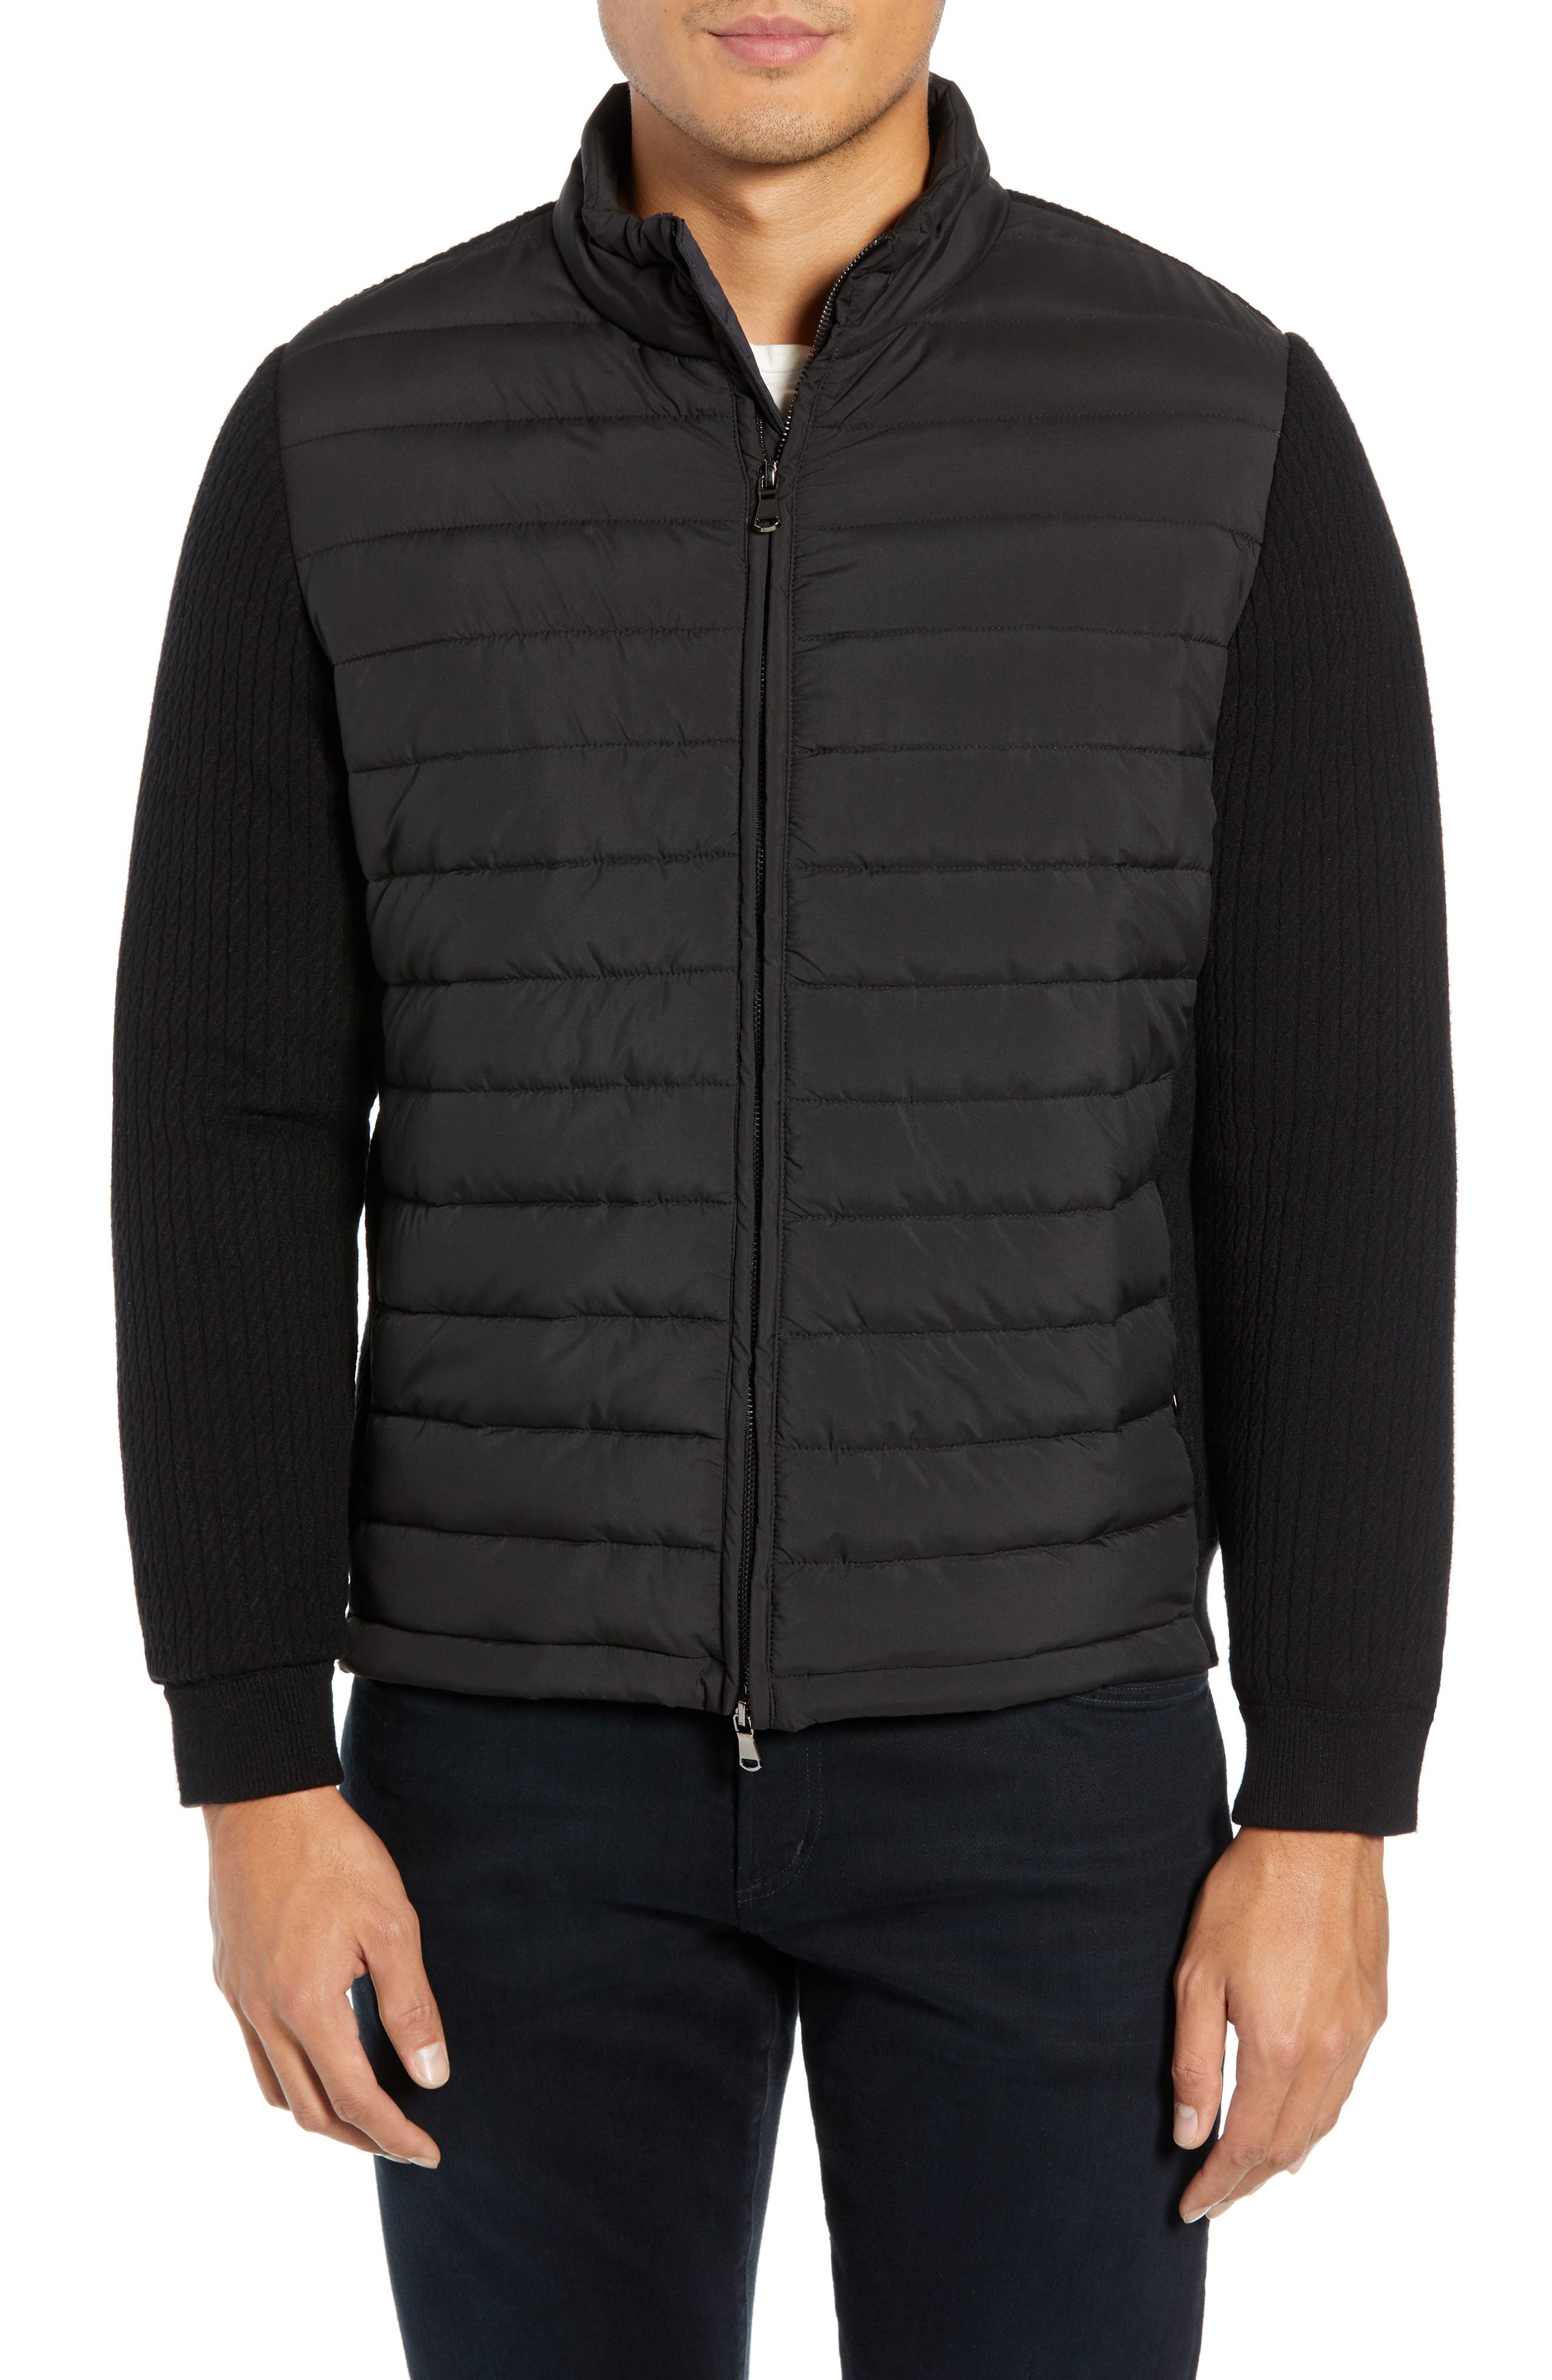 ZACHARY PRELL, Federal Jacket, Main thumbnail 1, color, BLACK